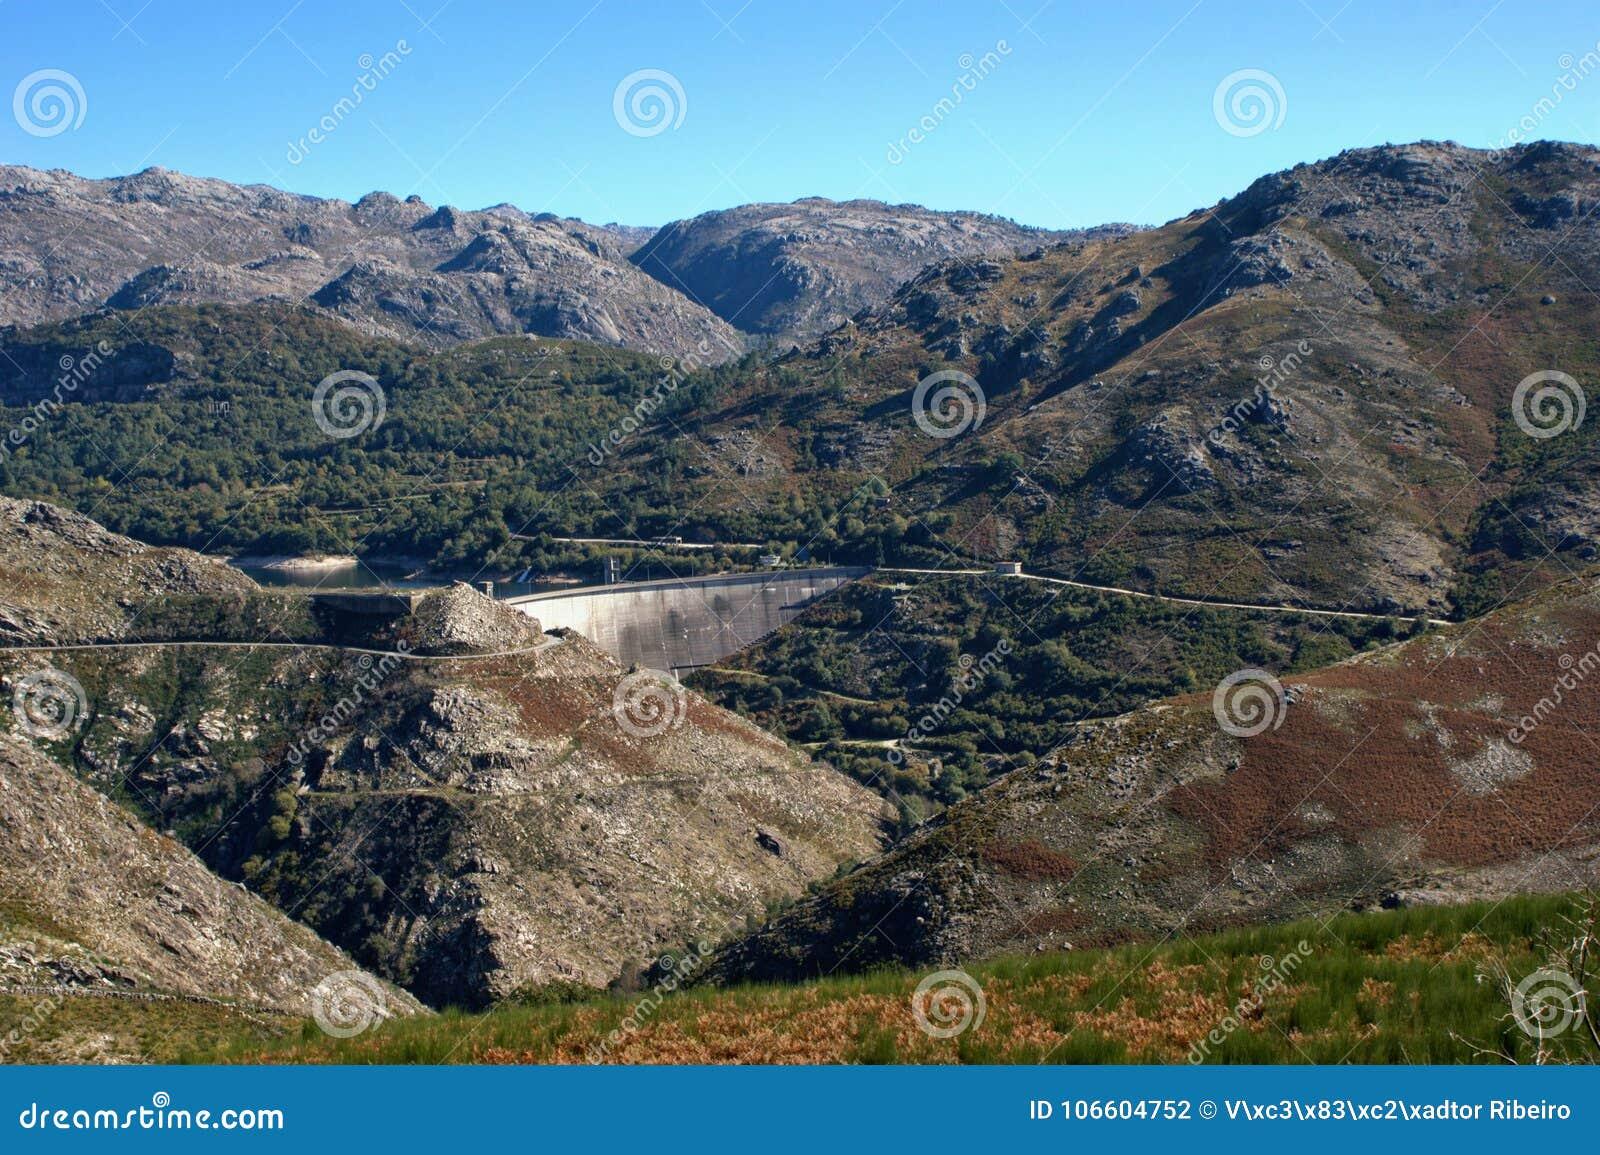 National Park of Peneda Geres